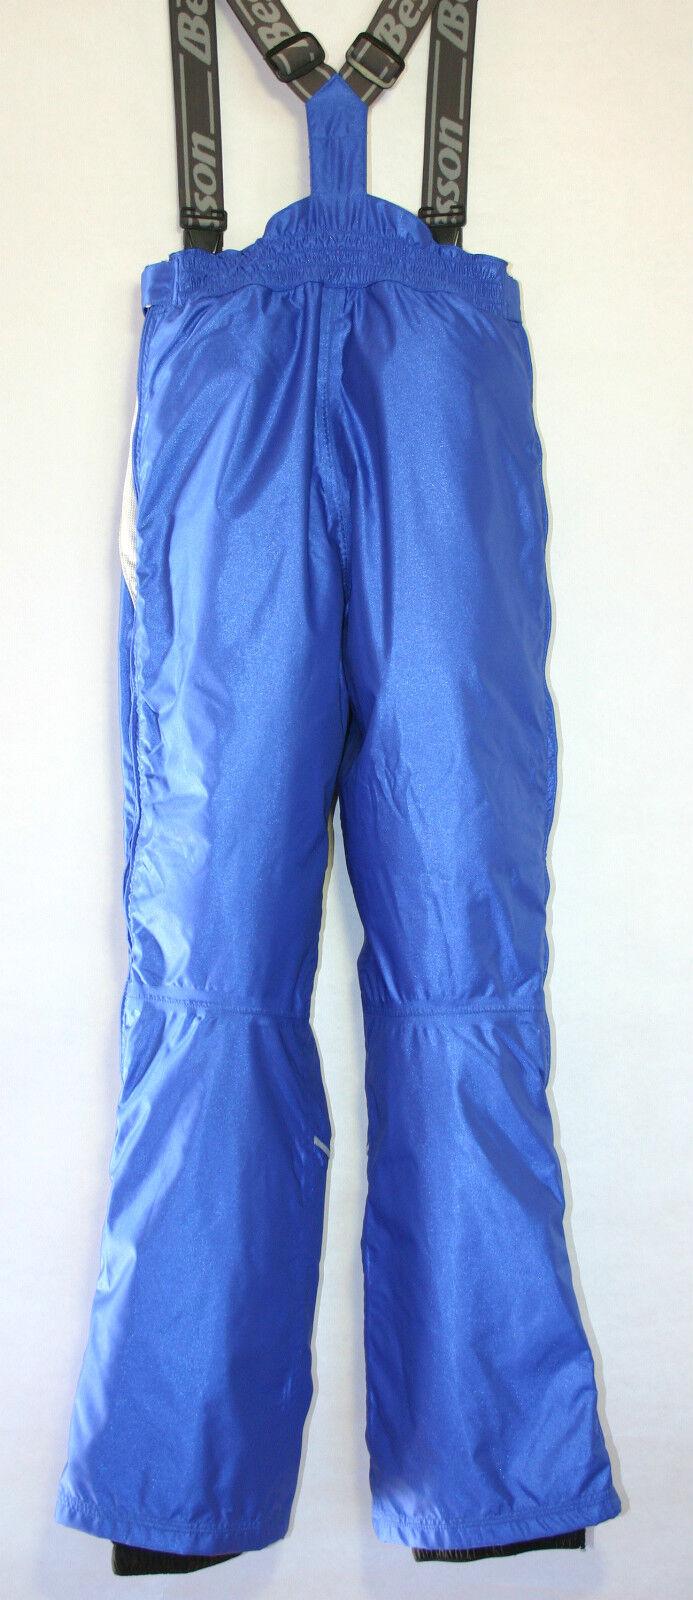 Anzi Besson Champlas Skihose Snowbordhose  Sidezip Sidezip Sidezip Träger  Damen 38 blau Neu d8929c